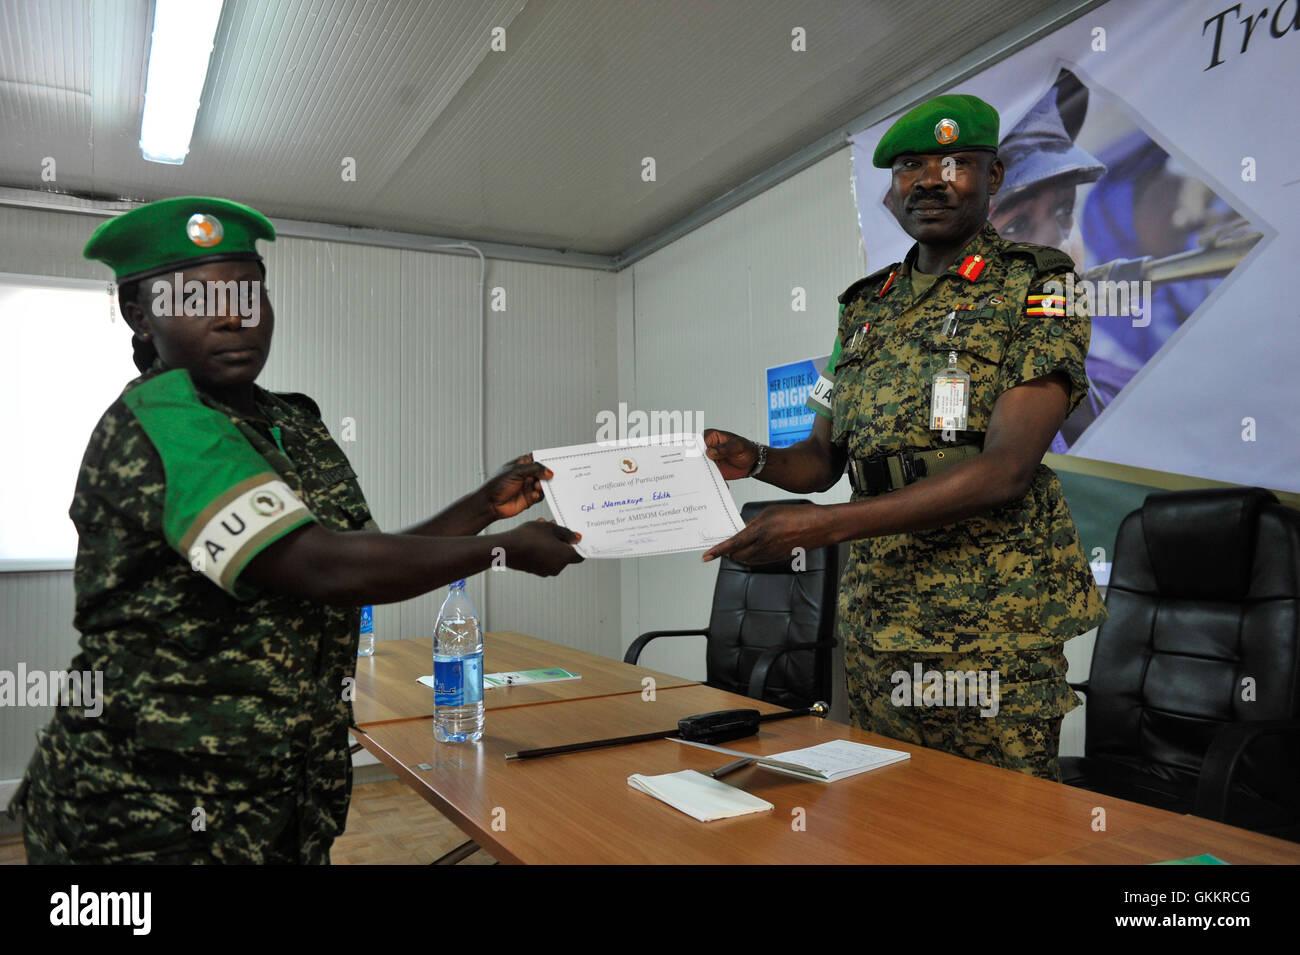 Maj. Gen. Nakibus Lakara, the Acting Force Commander of the African Union Mission in Somalia (AMISOM), awards a - Stock Image